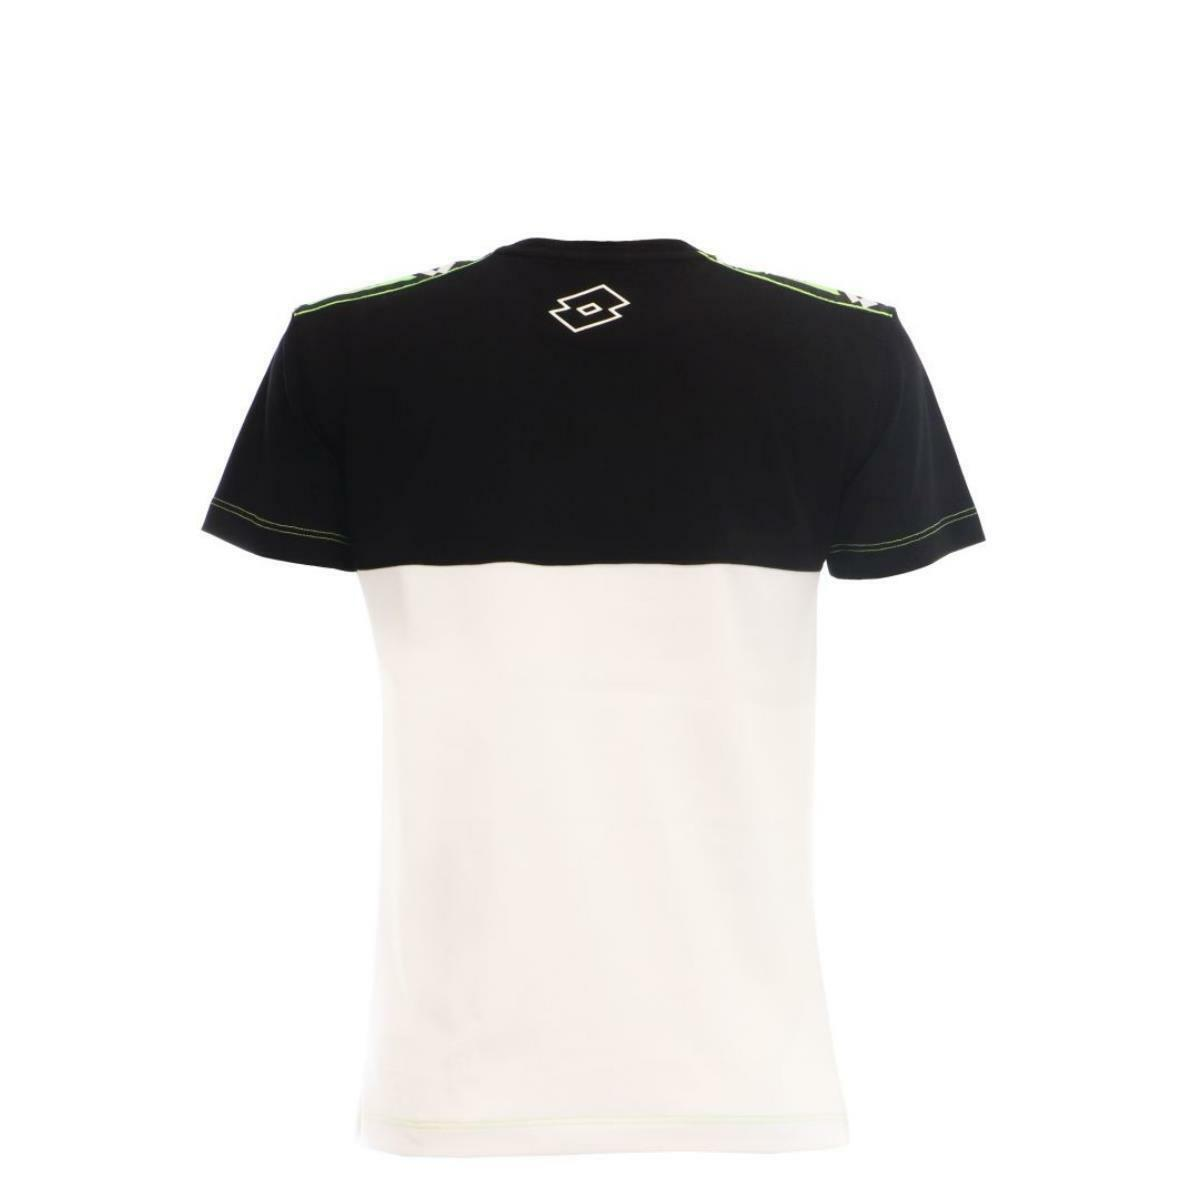 lotto lotto t-shirt bambino nero bianco ltss36